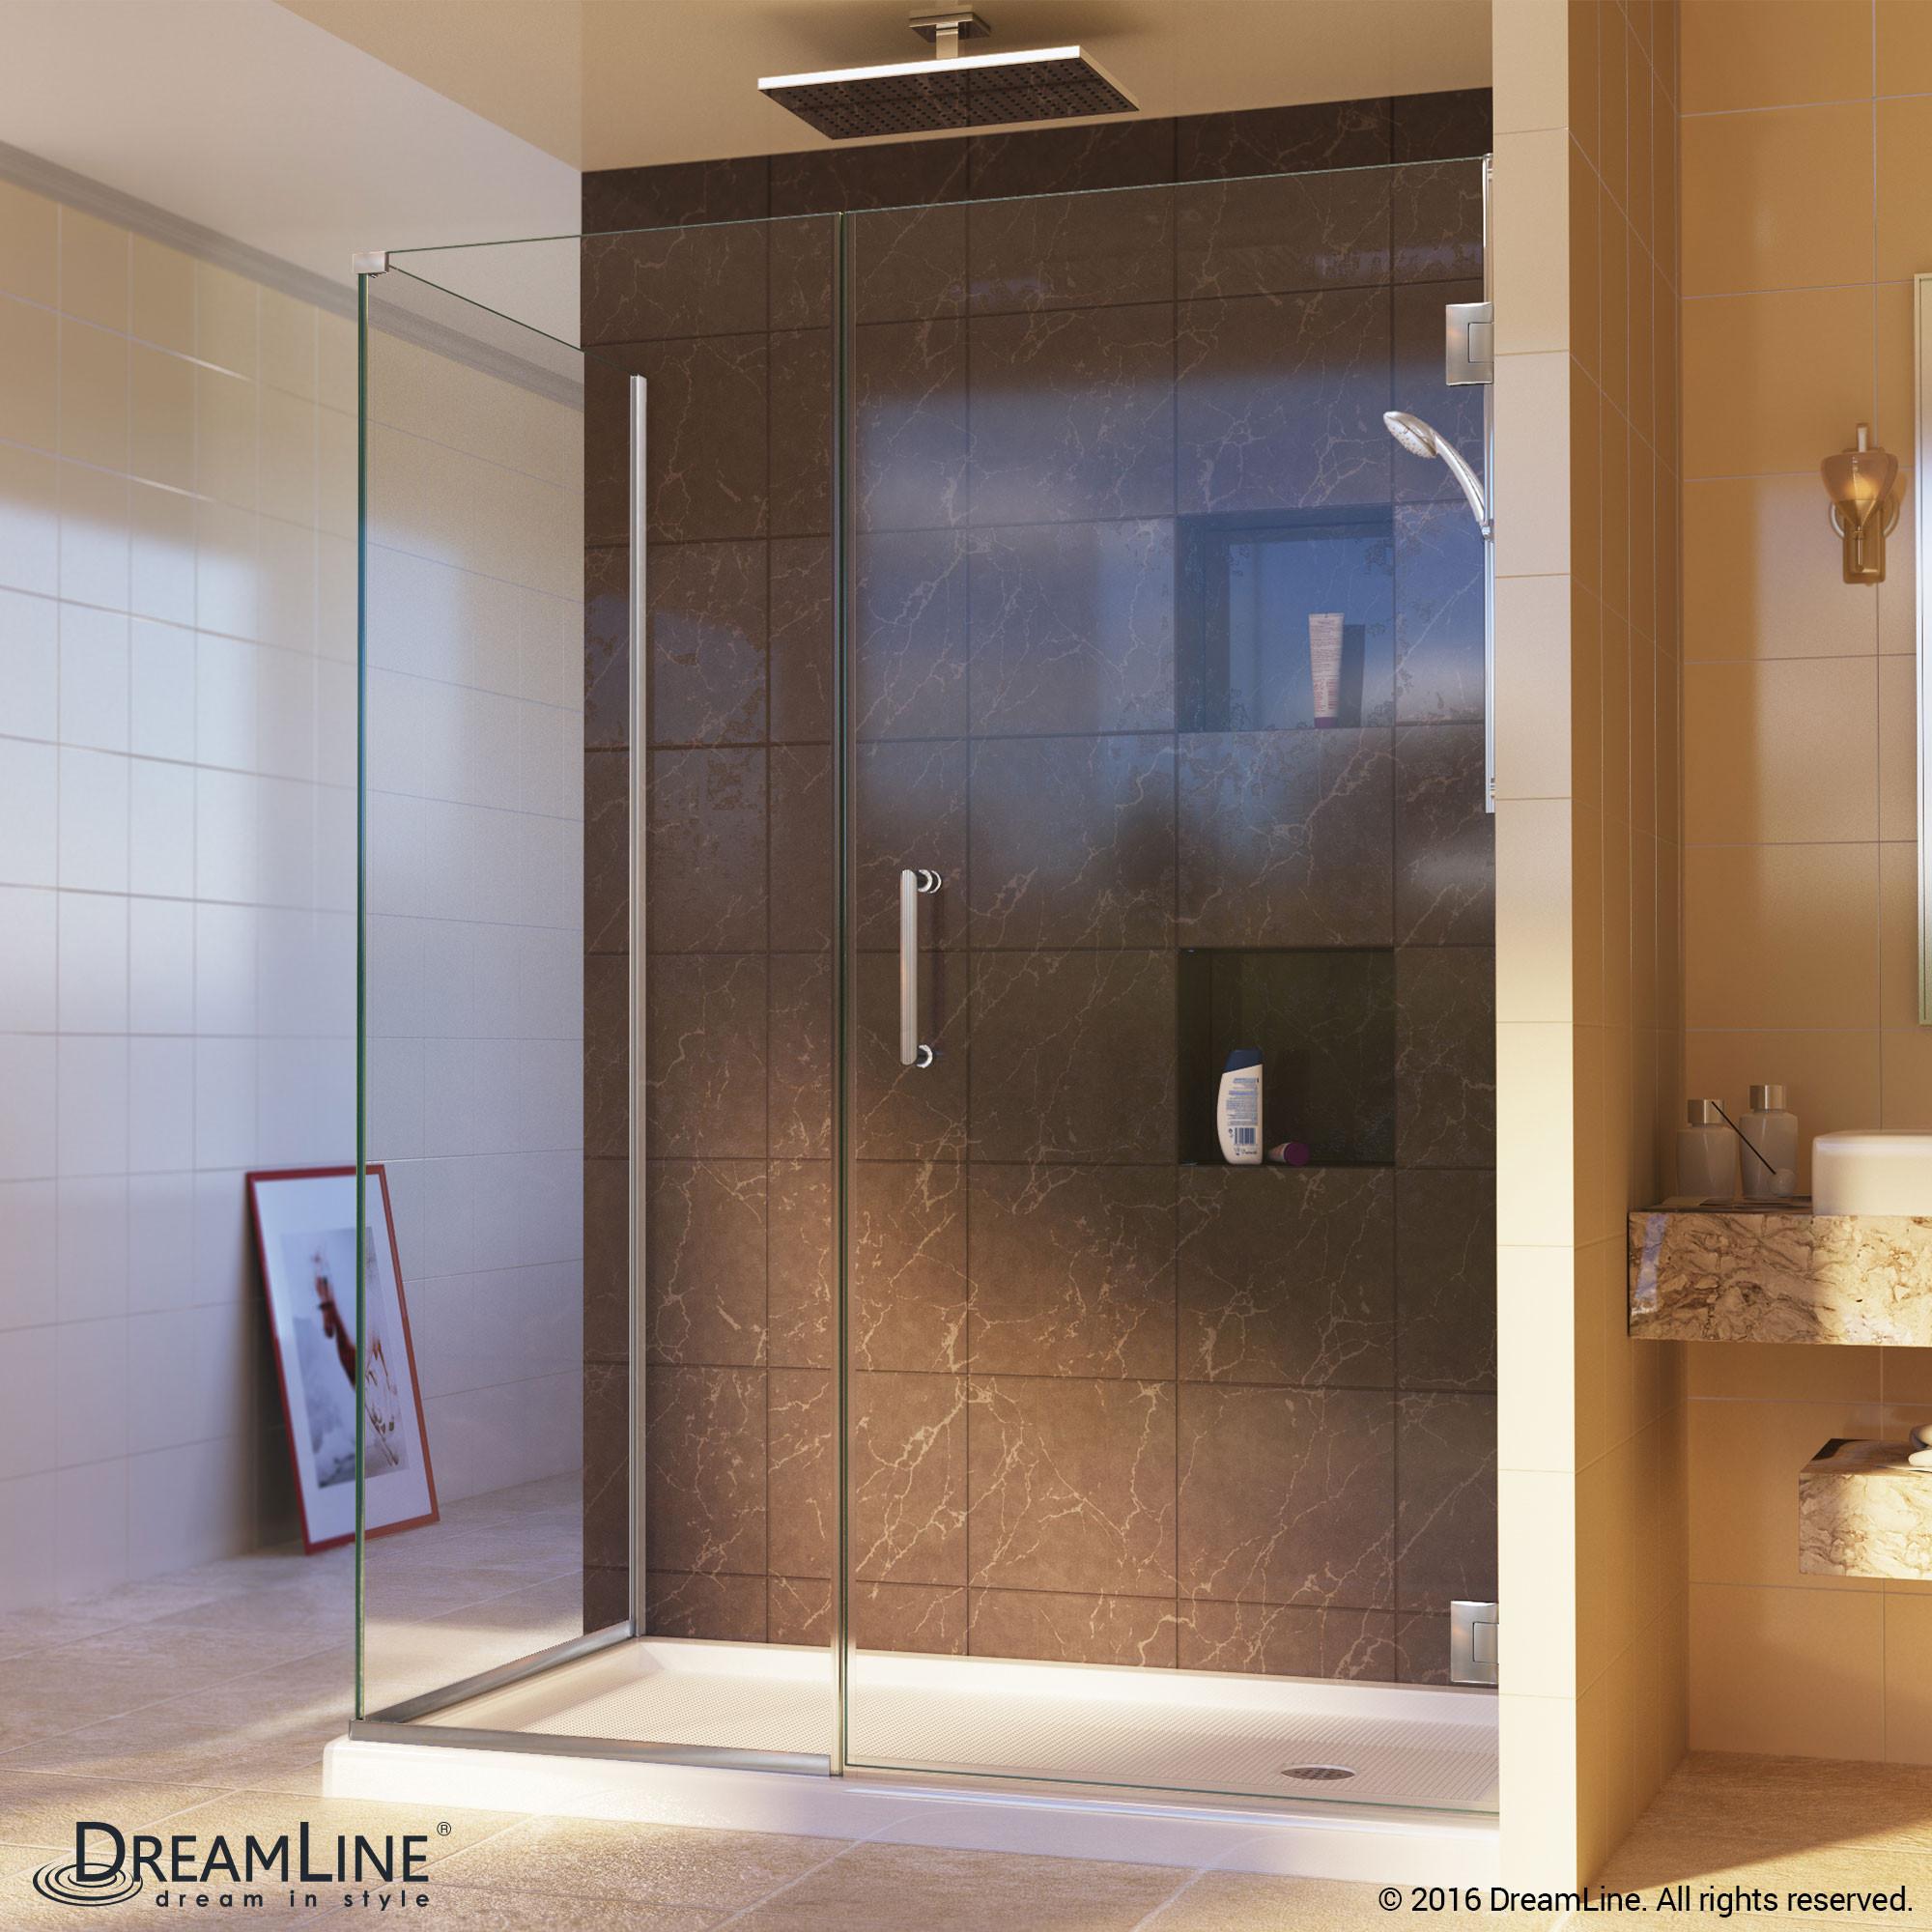 DreamLine SHEN-24595340-04 Unidoor Plus Hinged Shower Enclosure In Brushed Nickel Finish Hardware